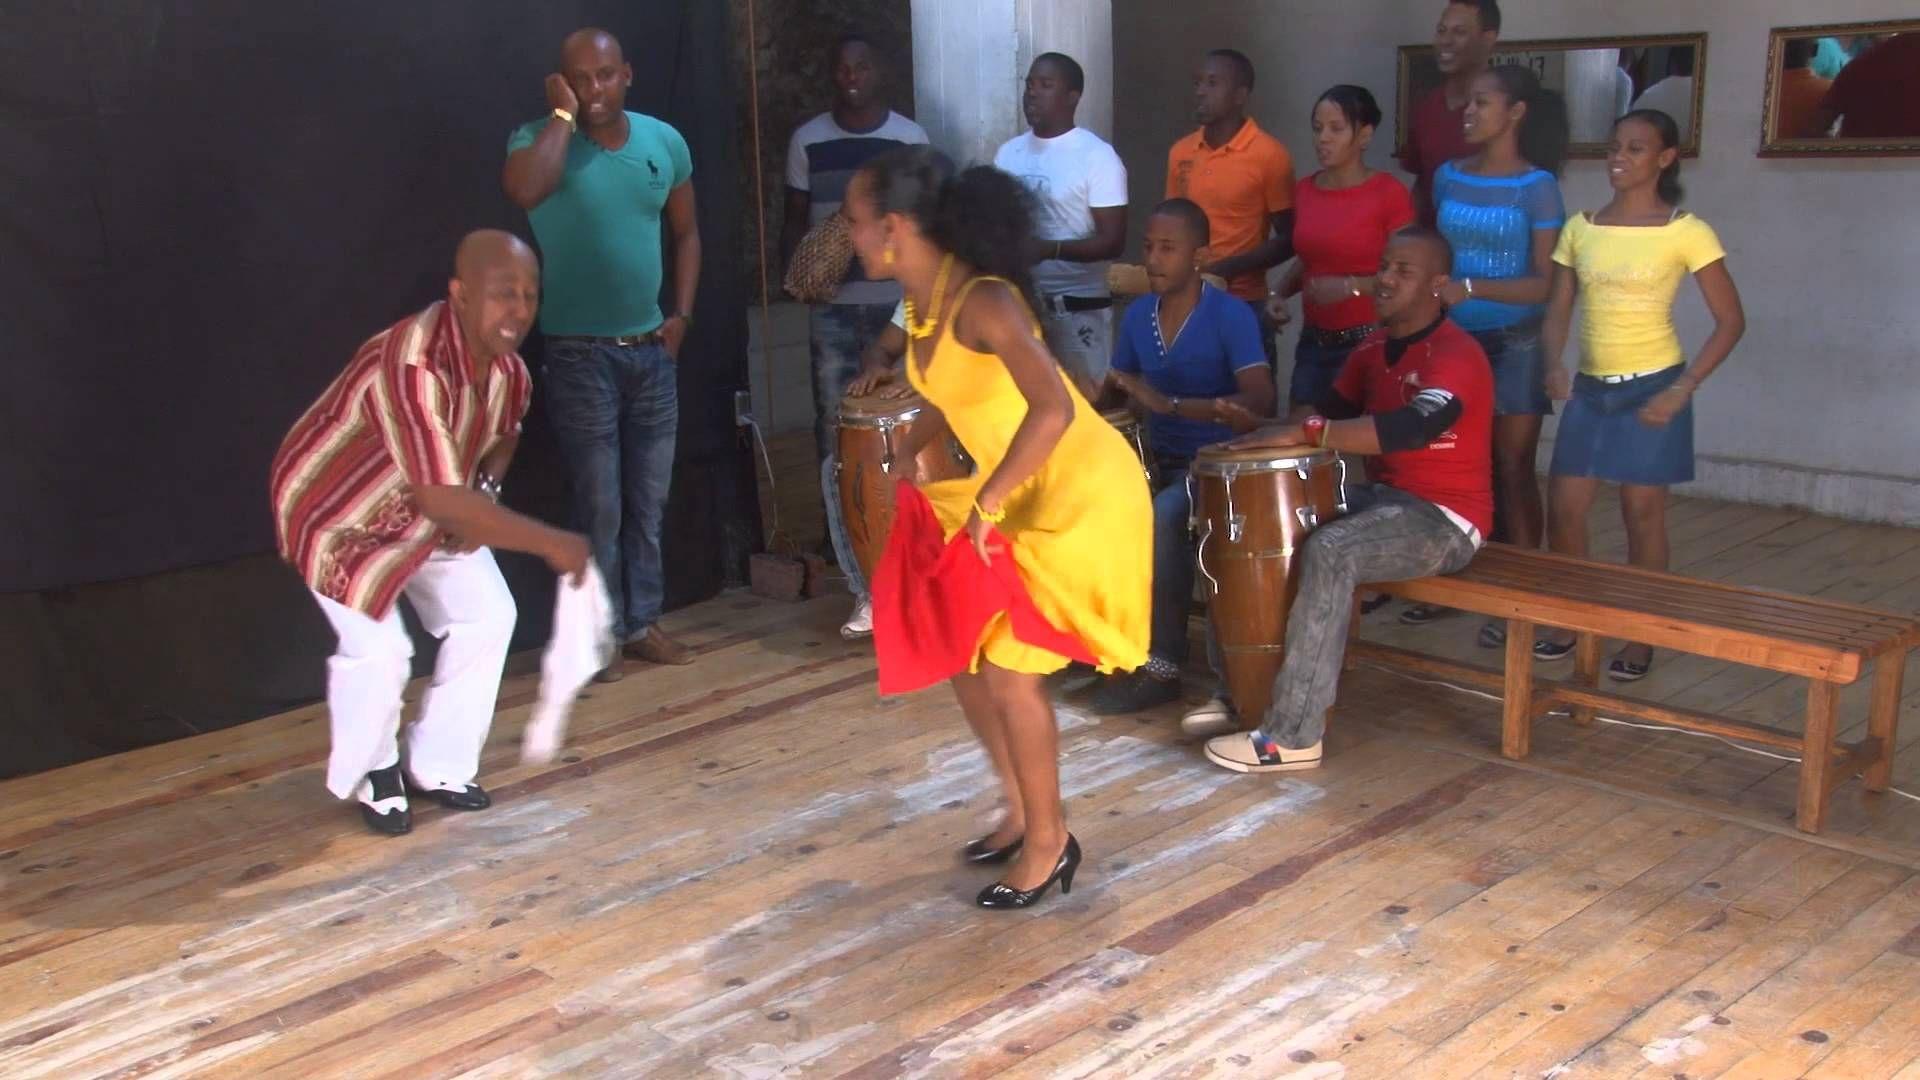 Rumba Guaguanco Dance Demo - Domingo Pau & Dayana Torres